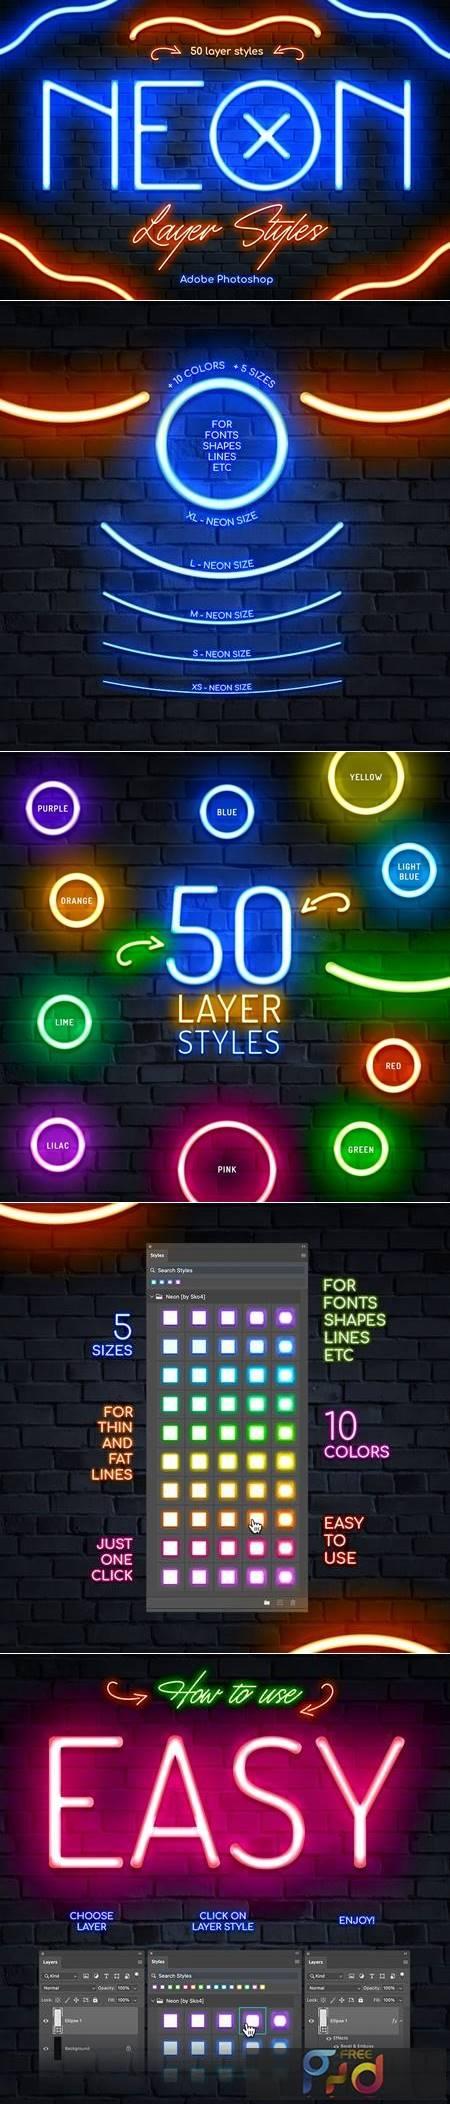 Neon Photoshop Layer Styles P6CYA3S 1